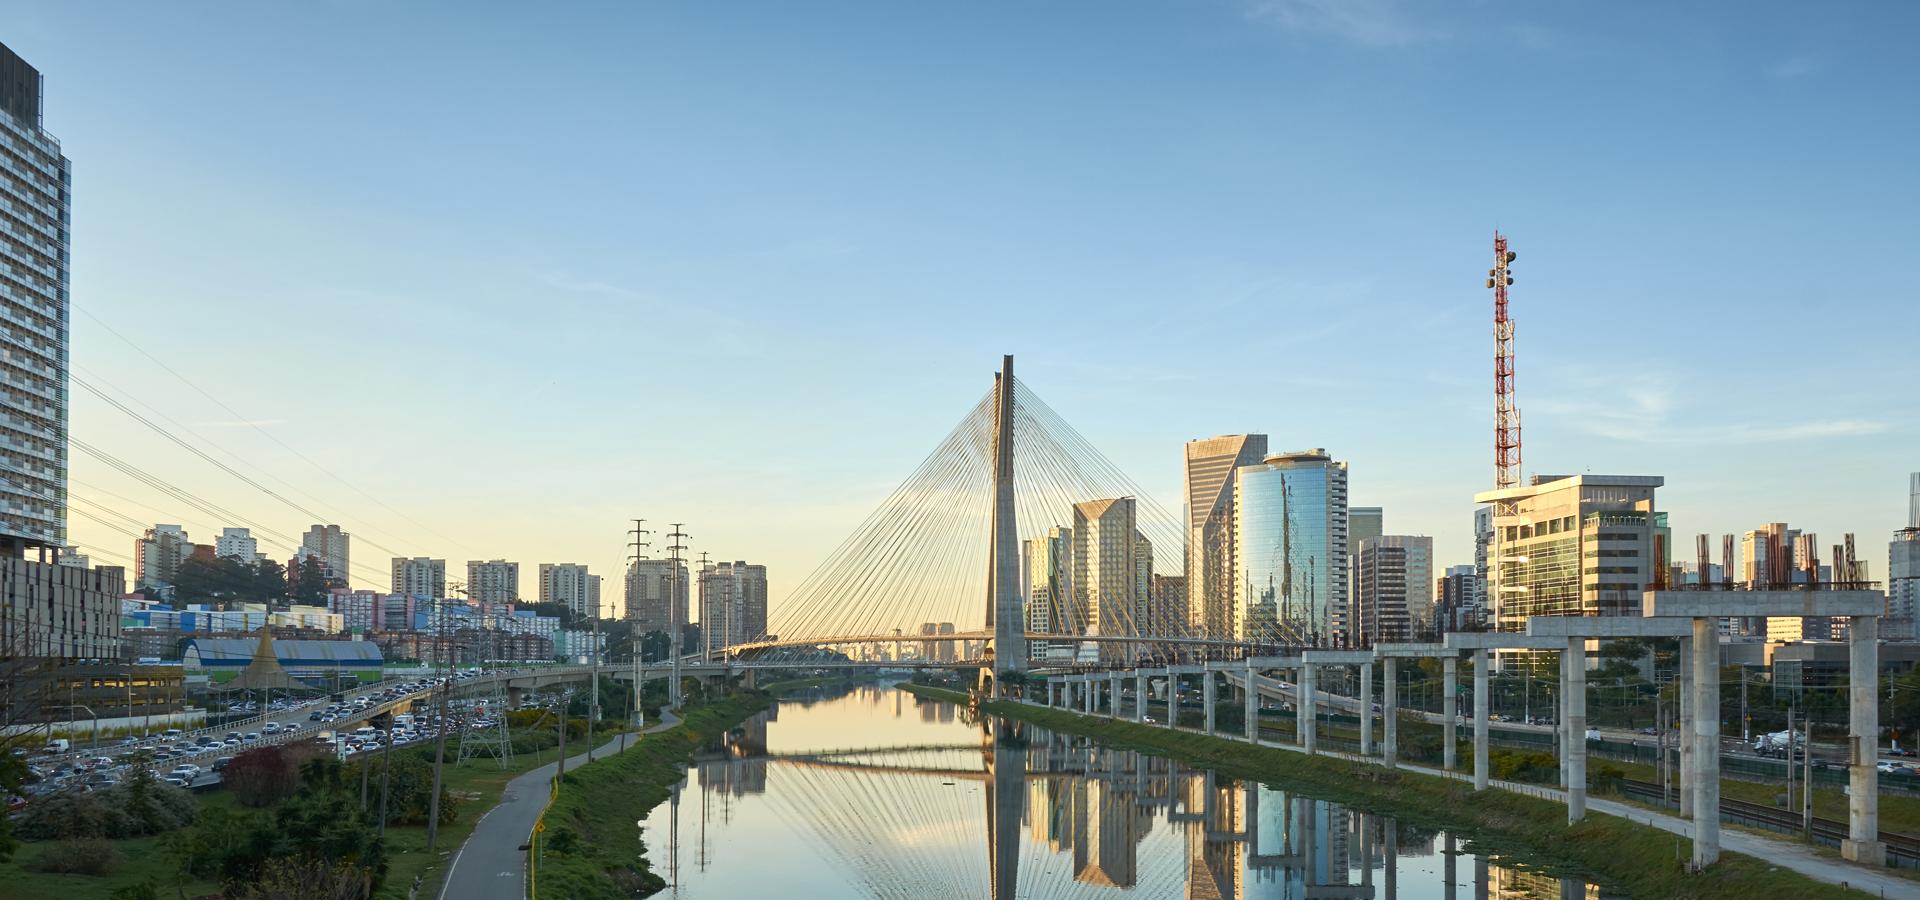 Peer-to-peer advisory in Jaú, São Paulo, Brazil